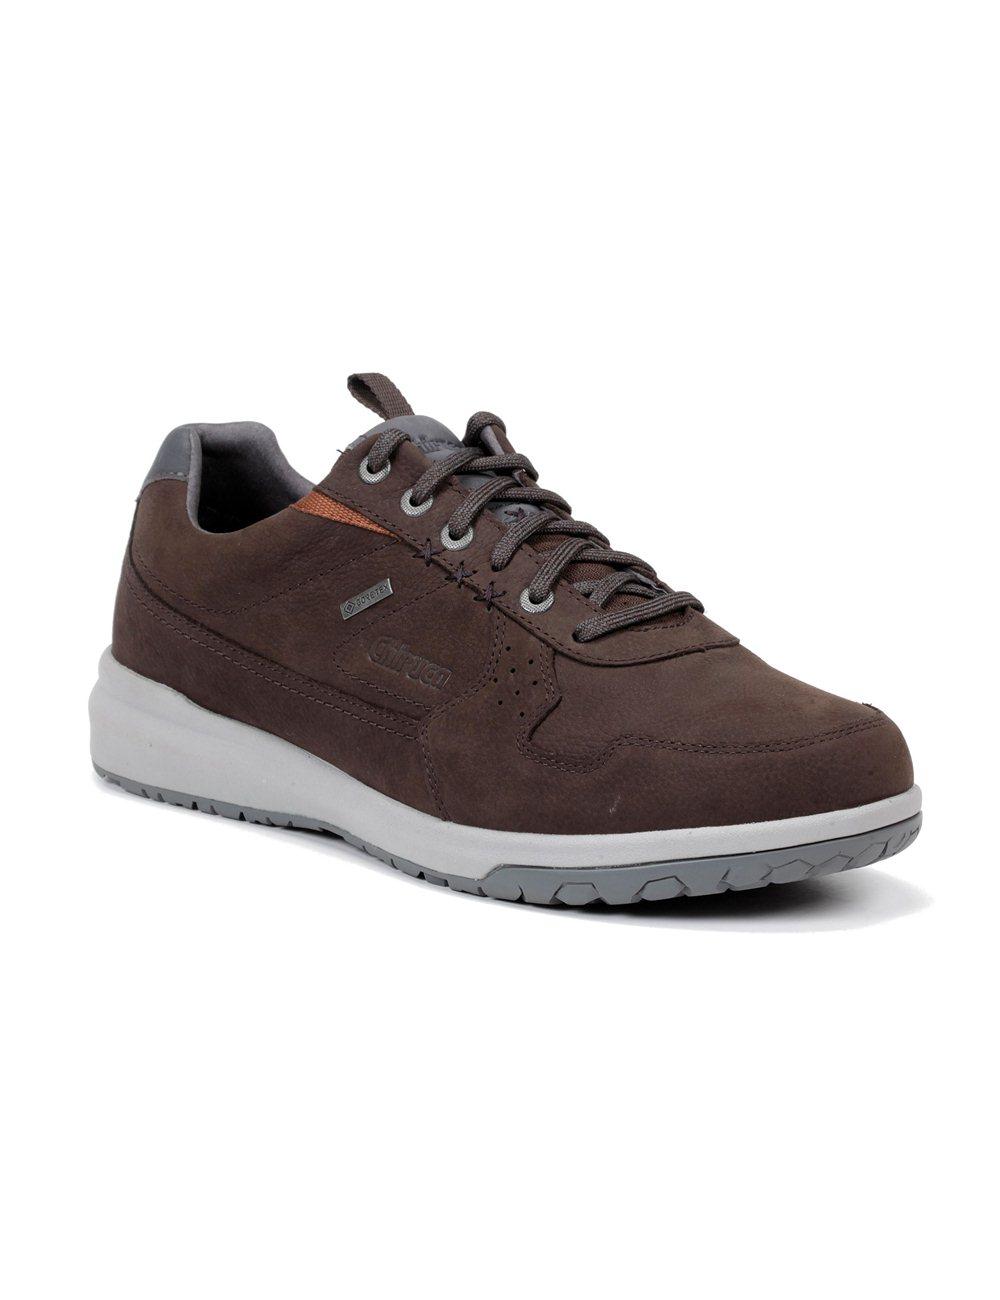 Zapatos Chiruca Metropolitan 12 Gore-Tex